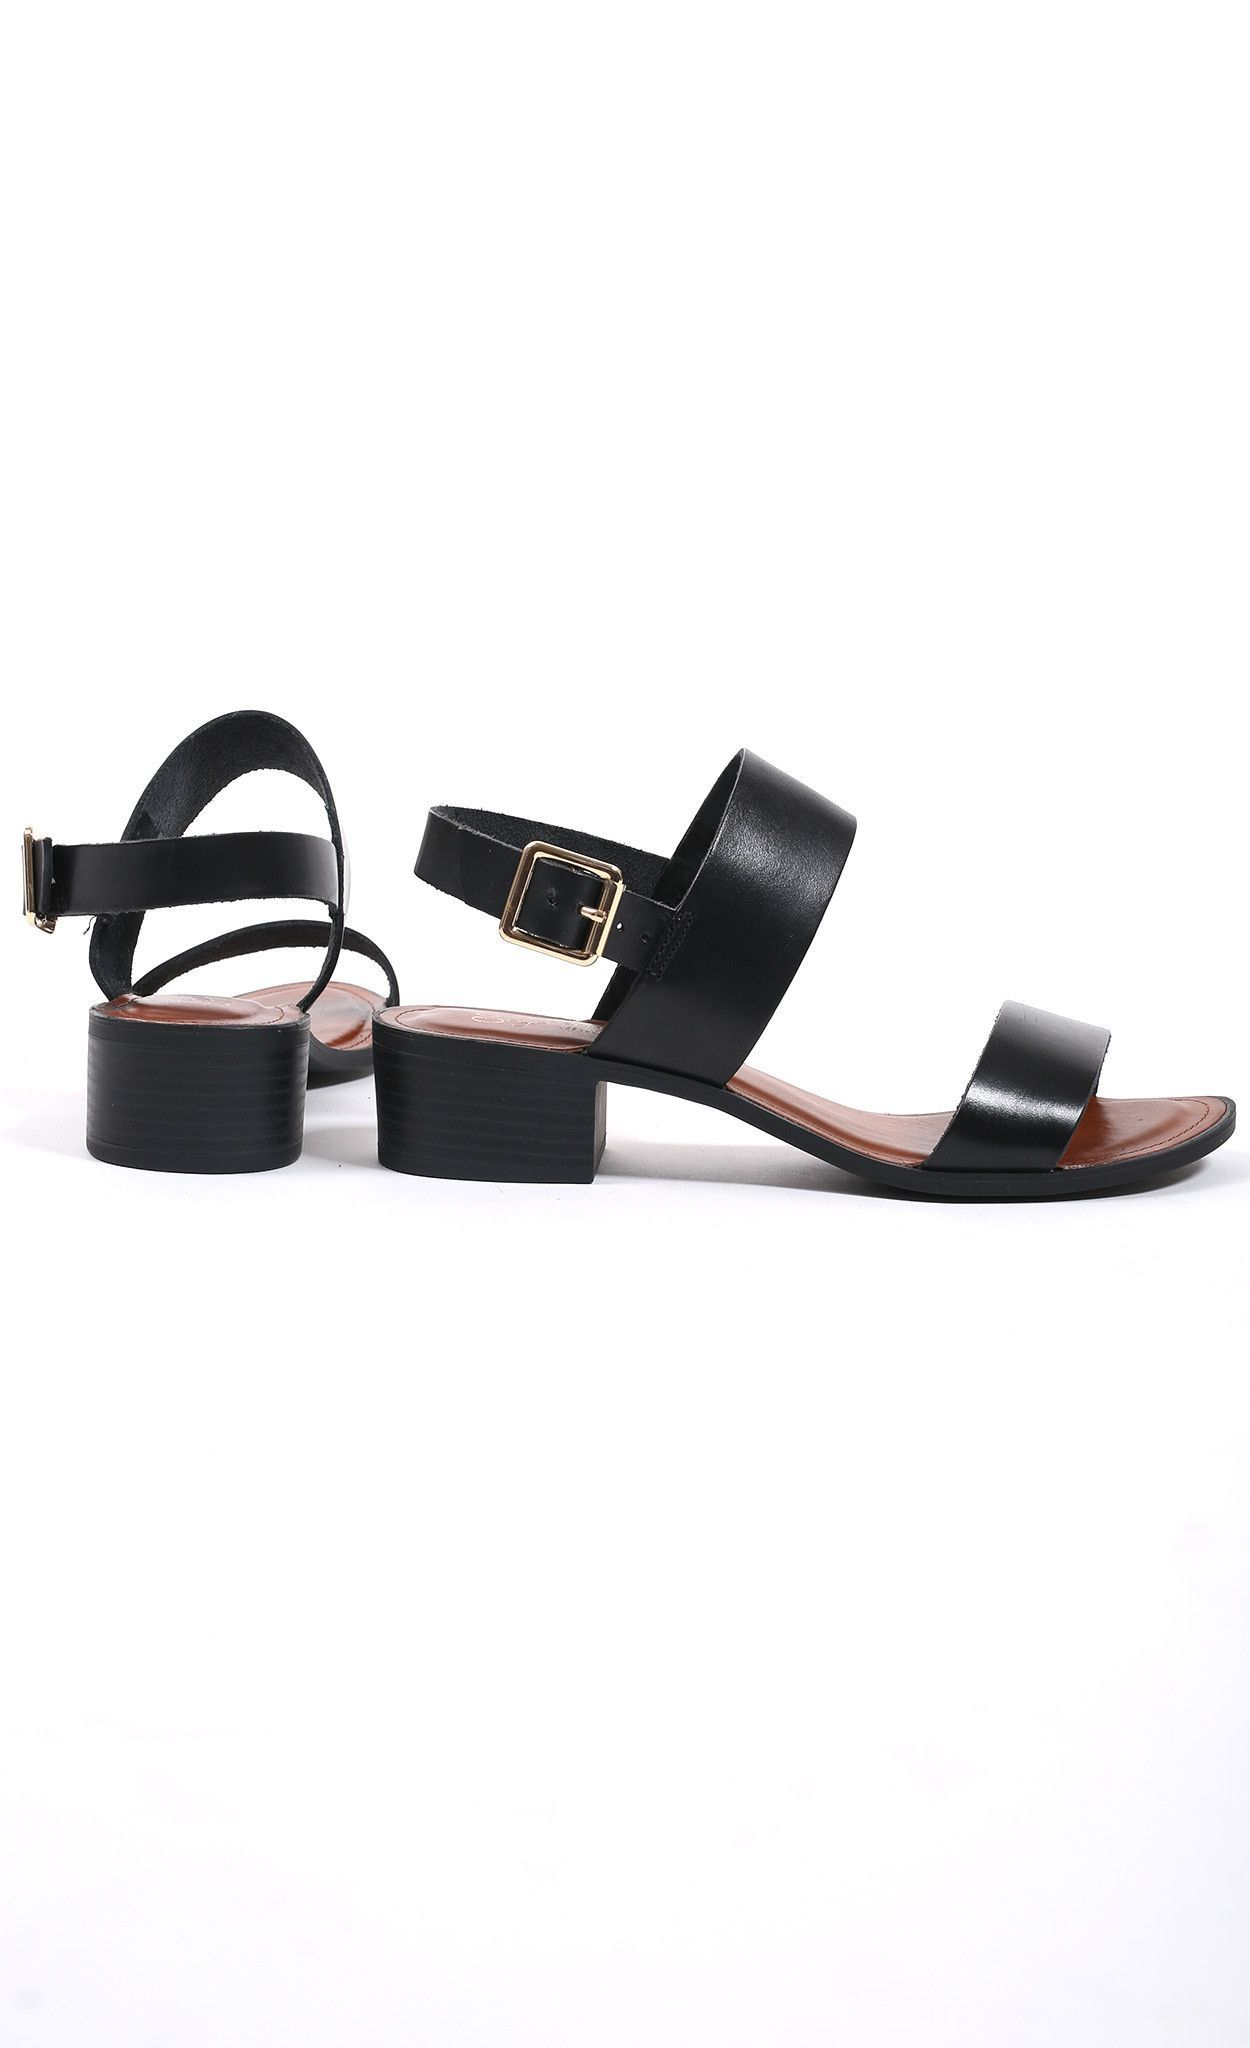 Seychelles - Shoe - Seychelles Cassiopeia Sandal - Black - Cheeky Peach Boutique - 4